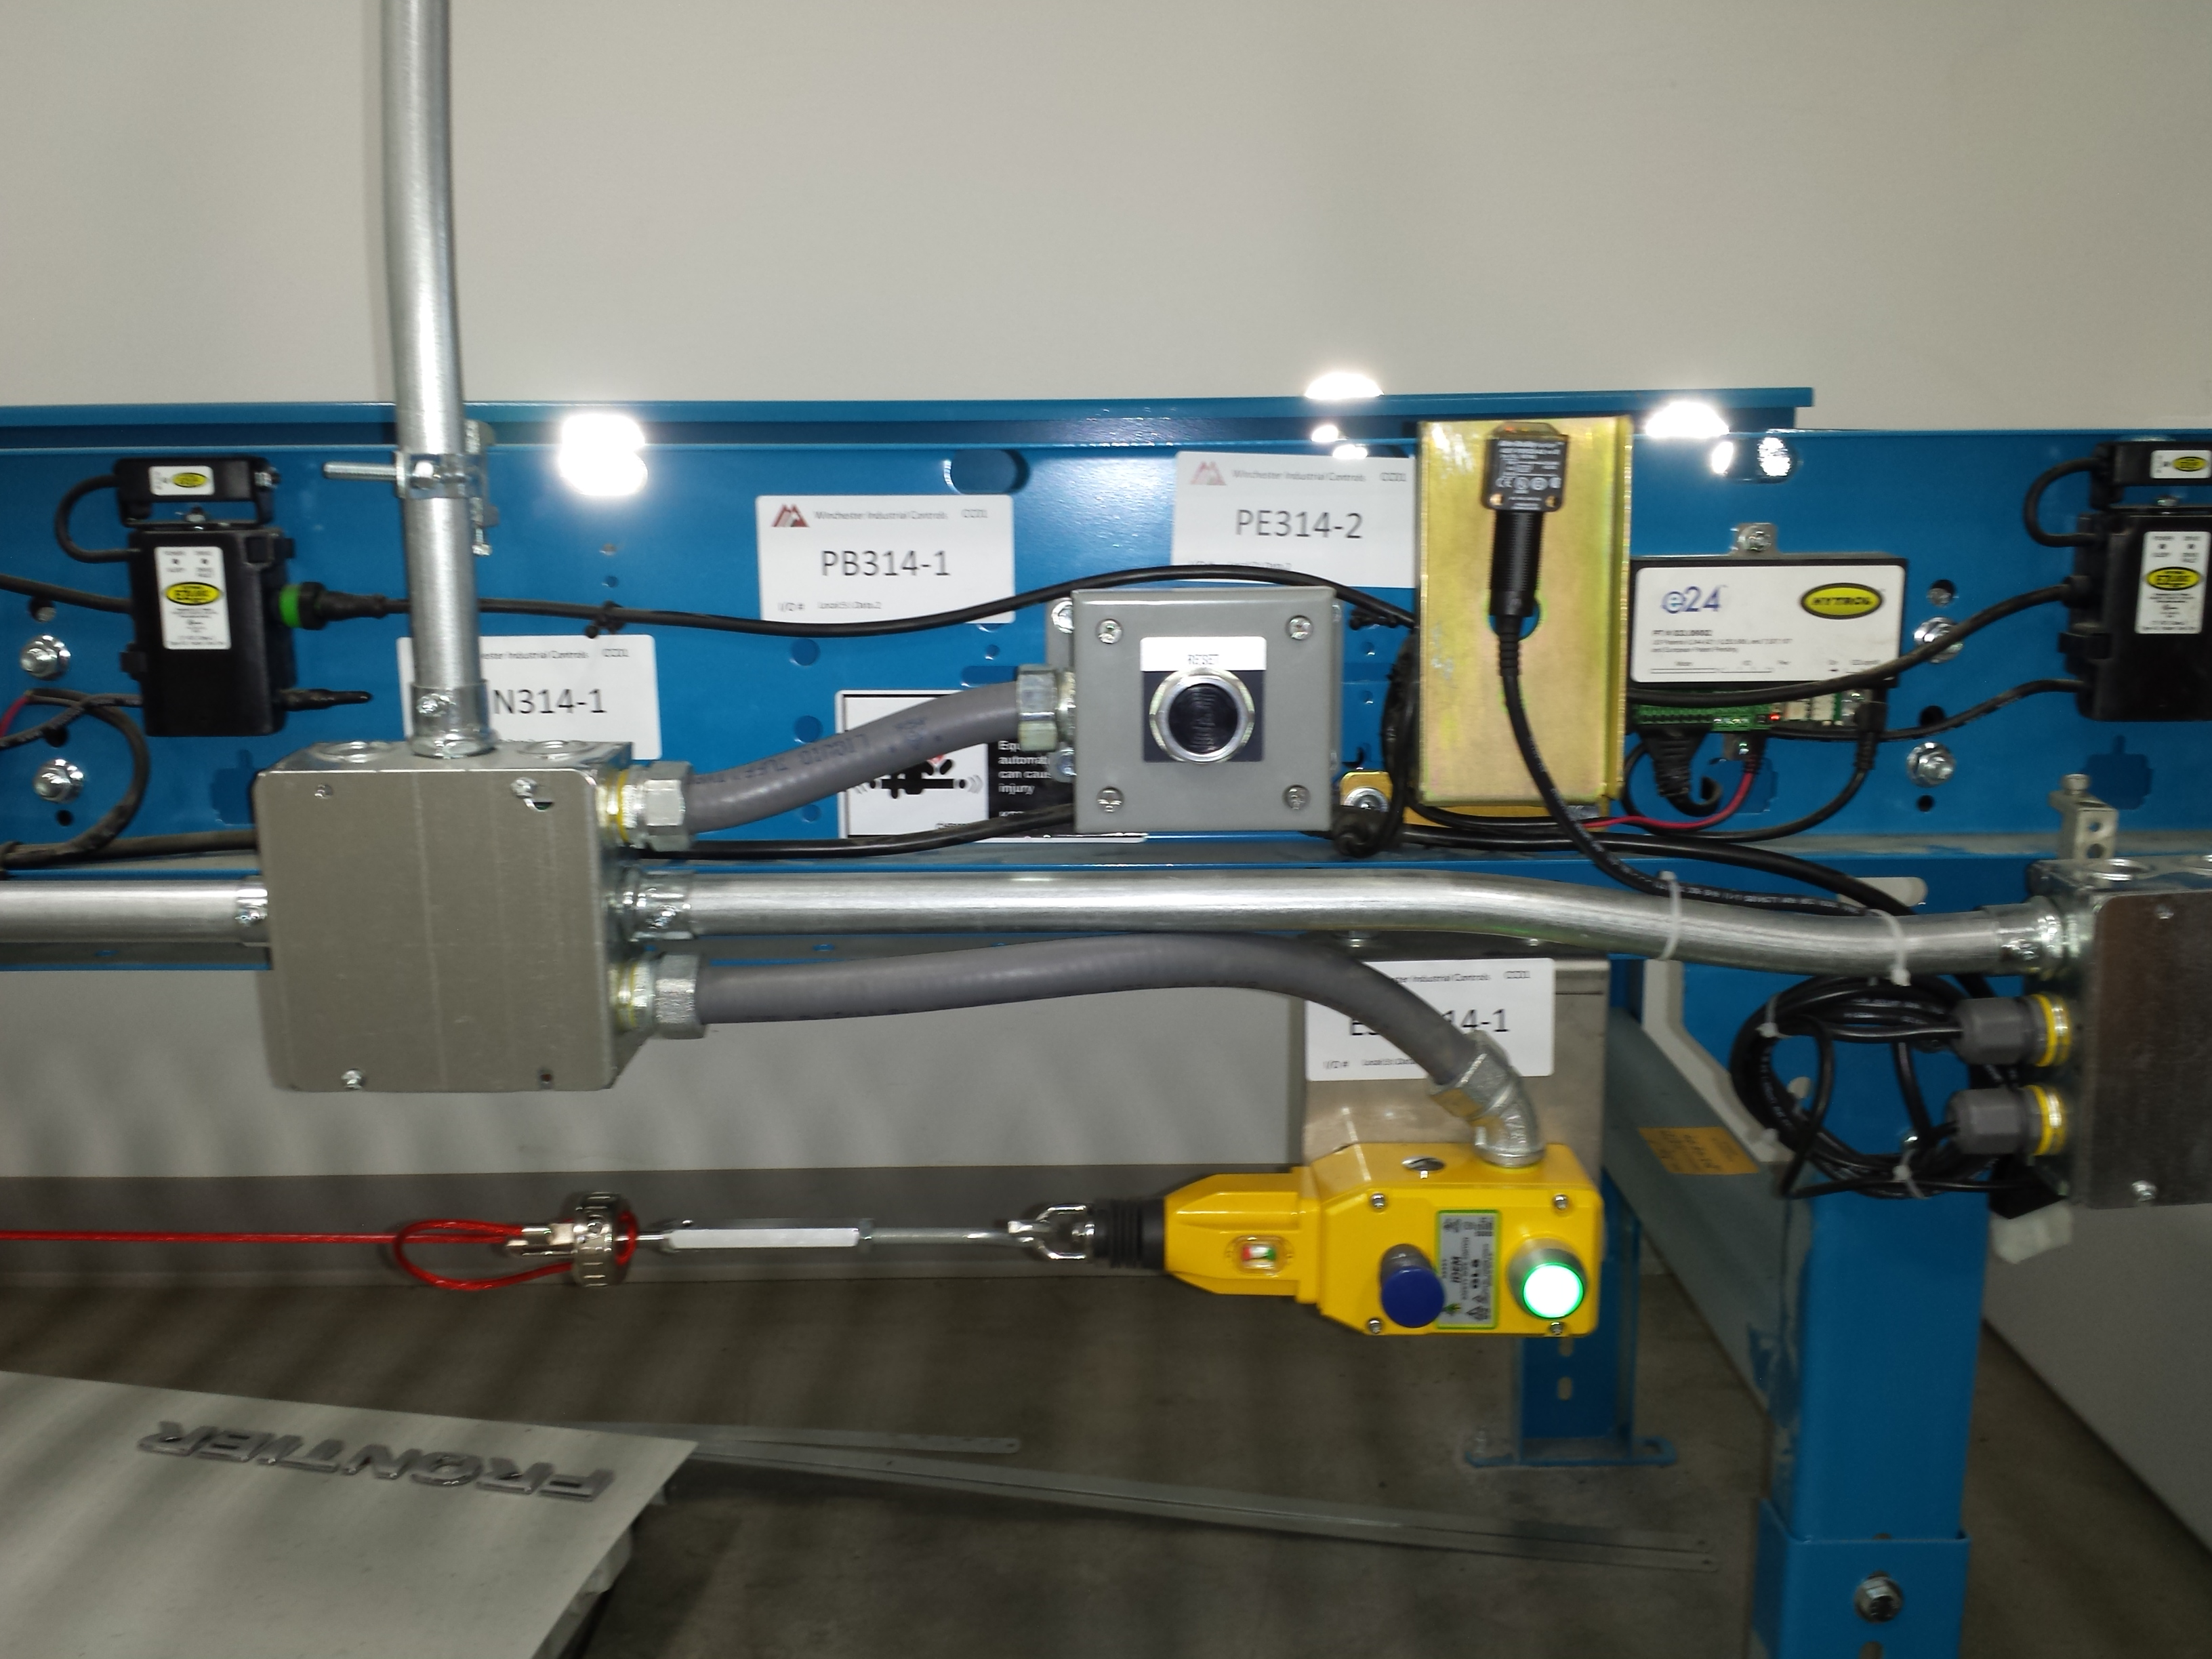 Electrical Contractors/Installers